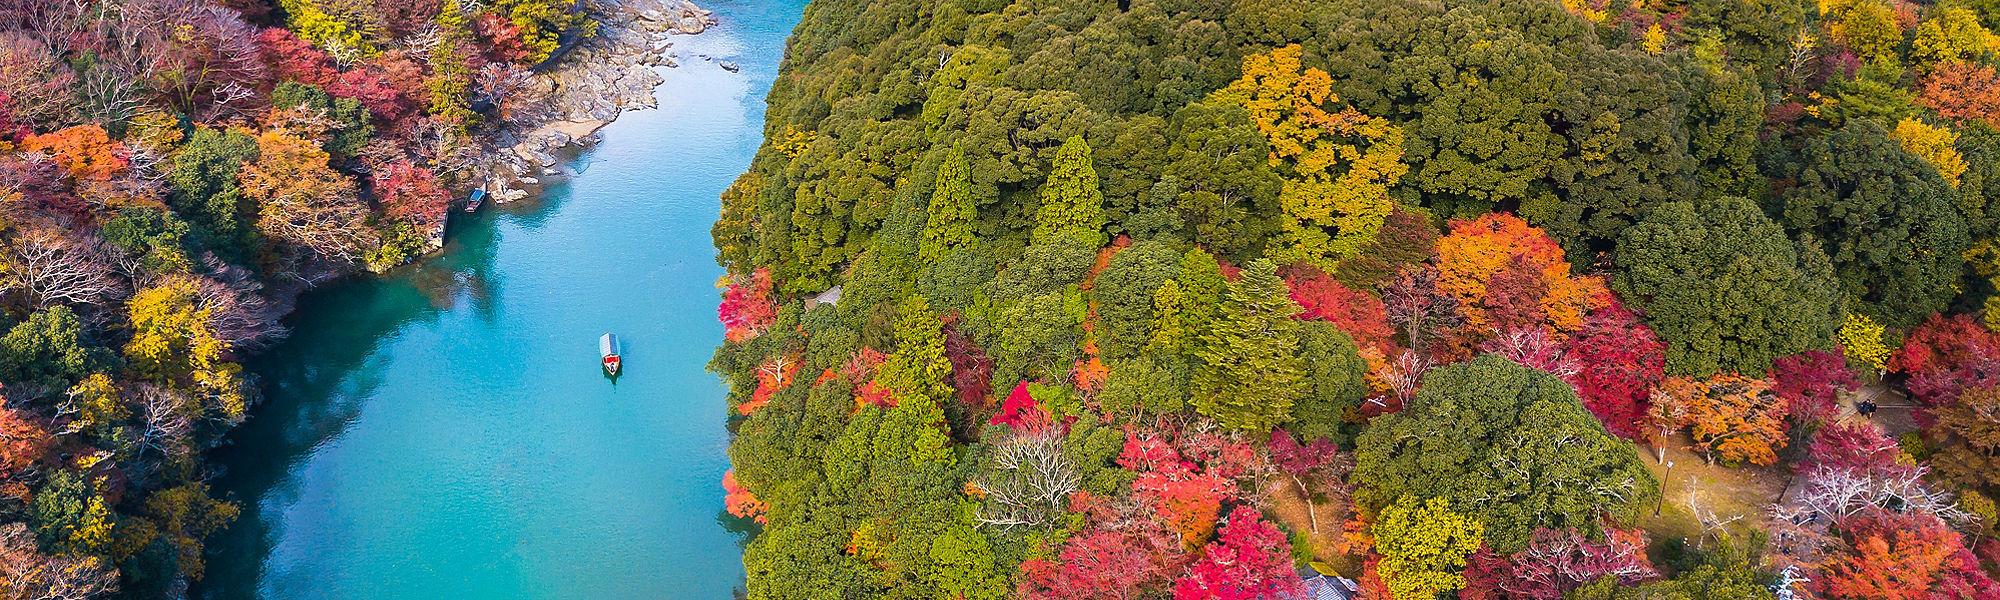 Aerial boat river autumn Kyoto